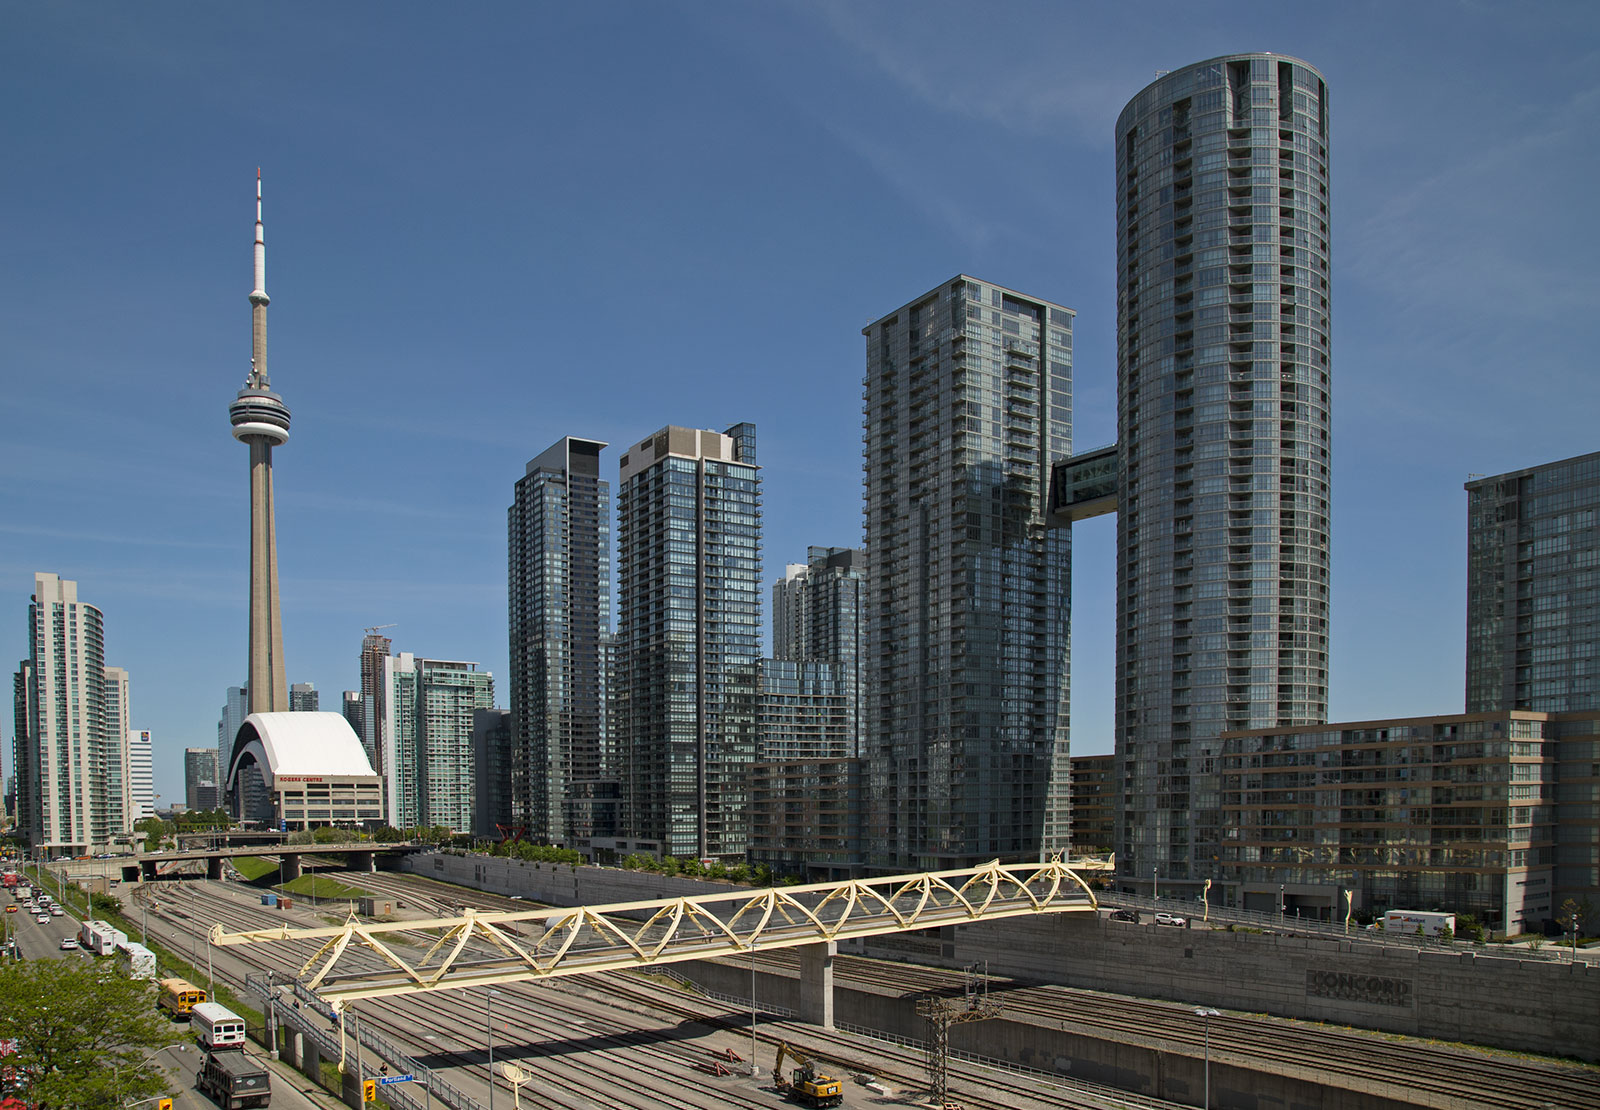 20140602. An aerial view of the Puente de Luz bridge and CityPlace (Toronto).